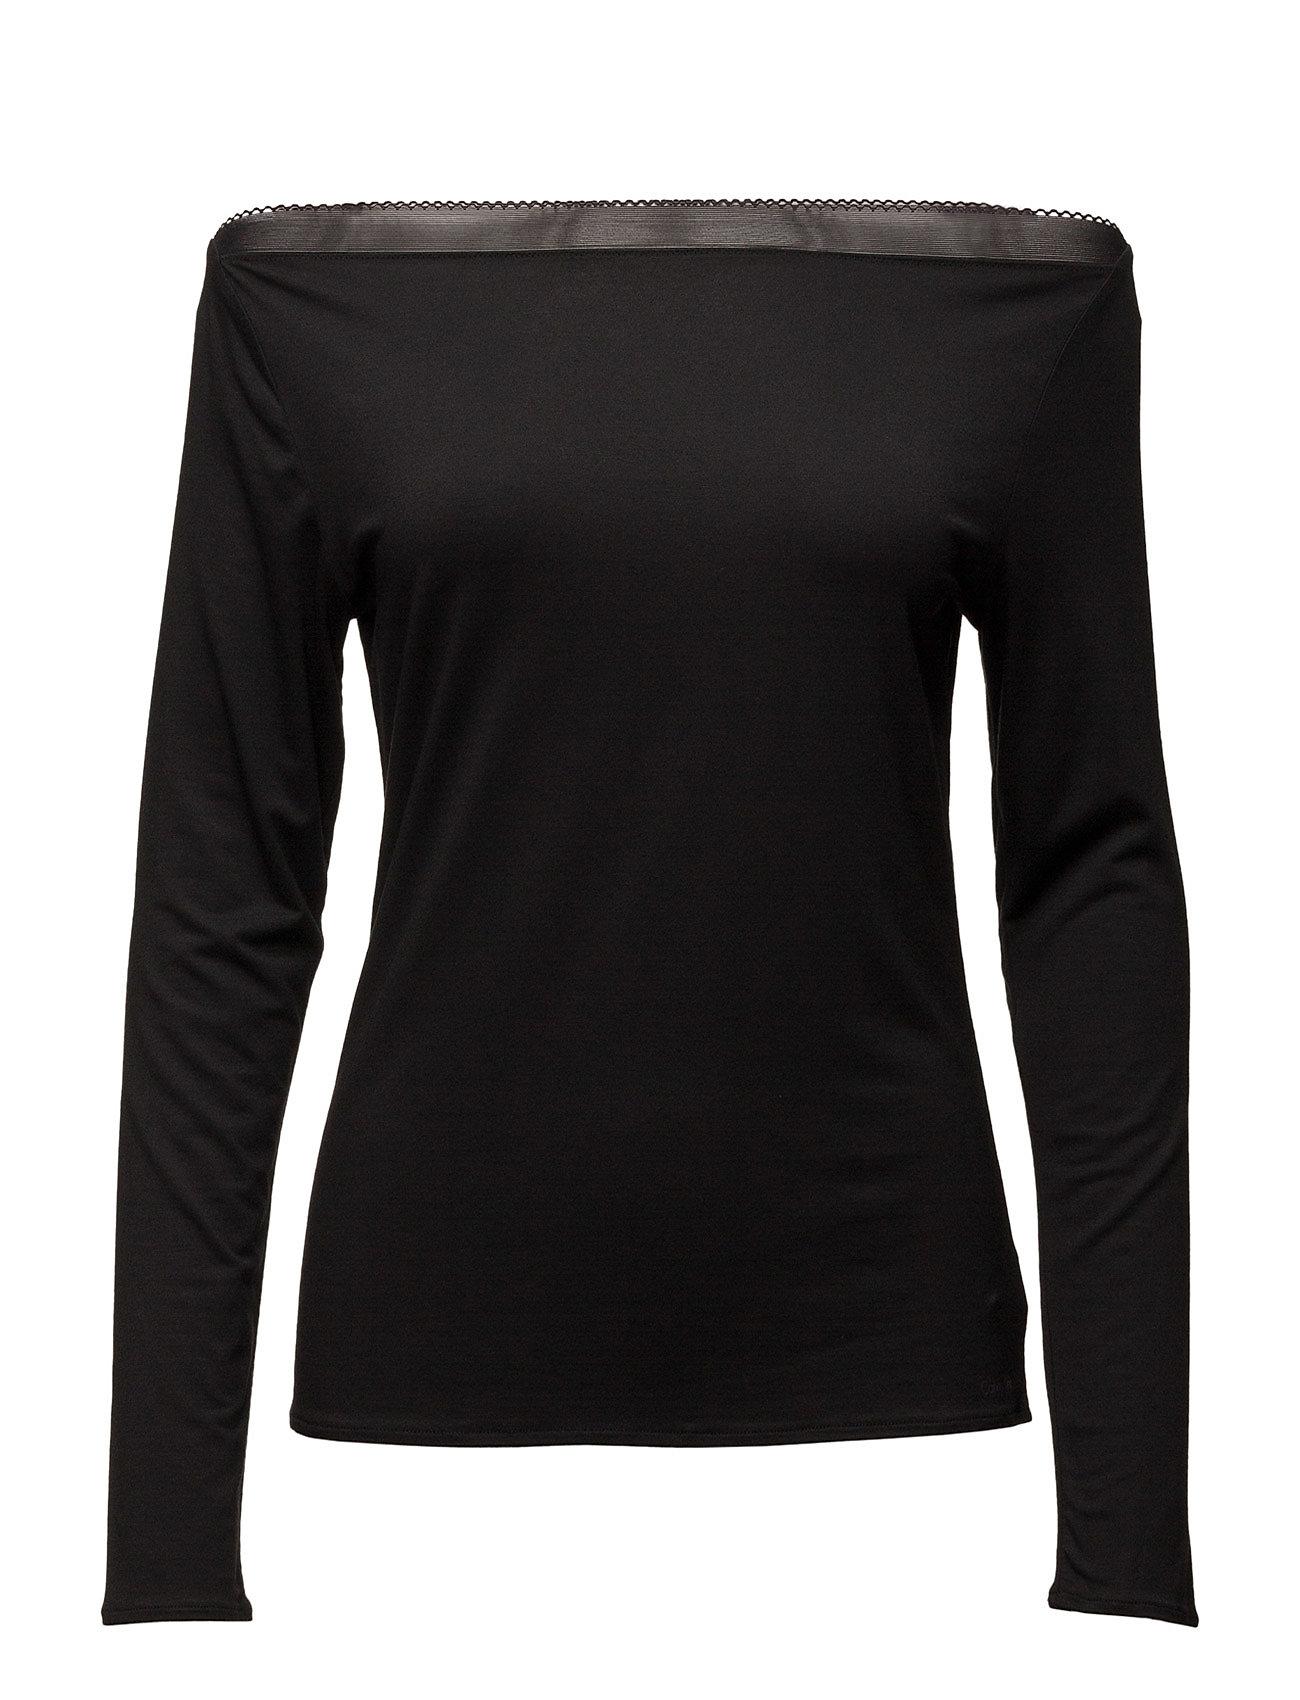 L/S Pj Top Calvin Klein Loungewear til Damer i Sort